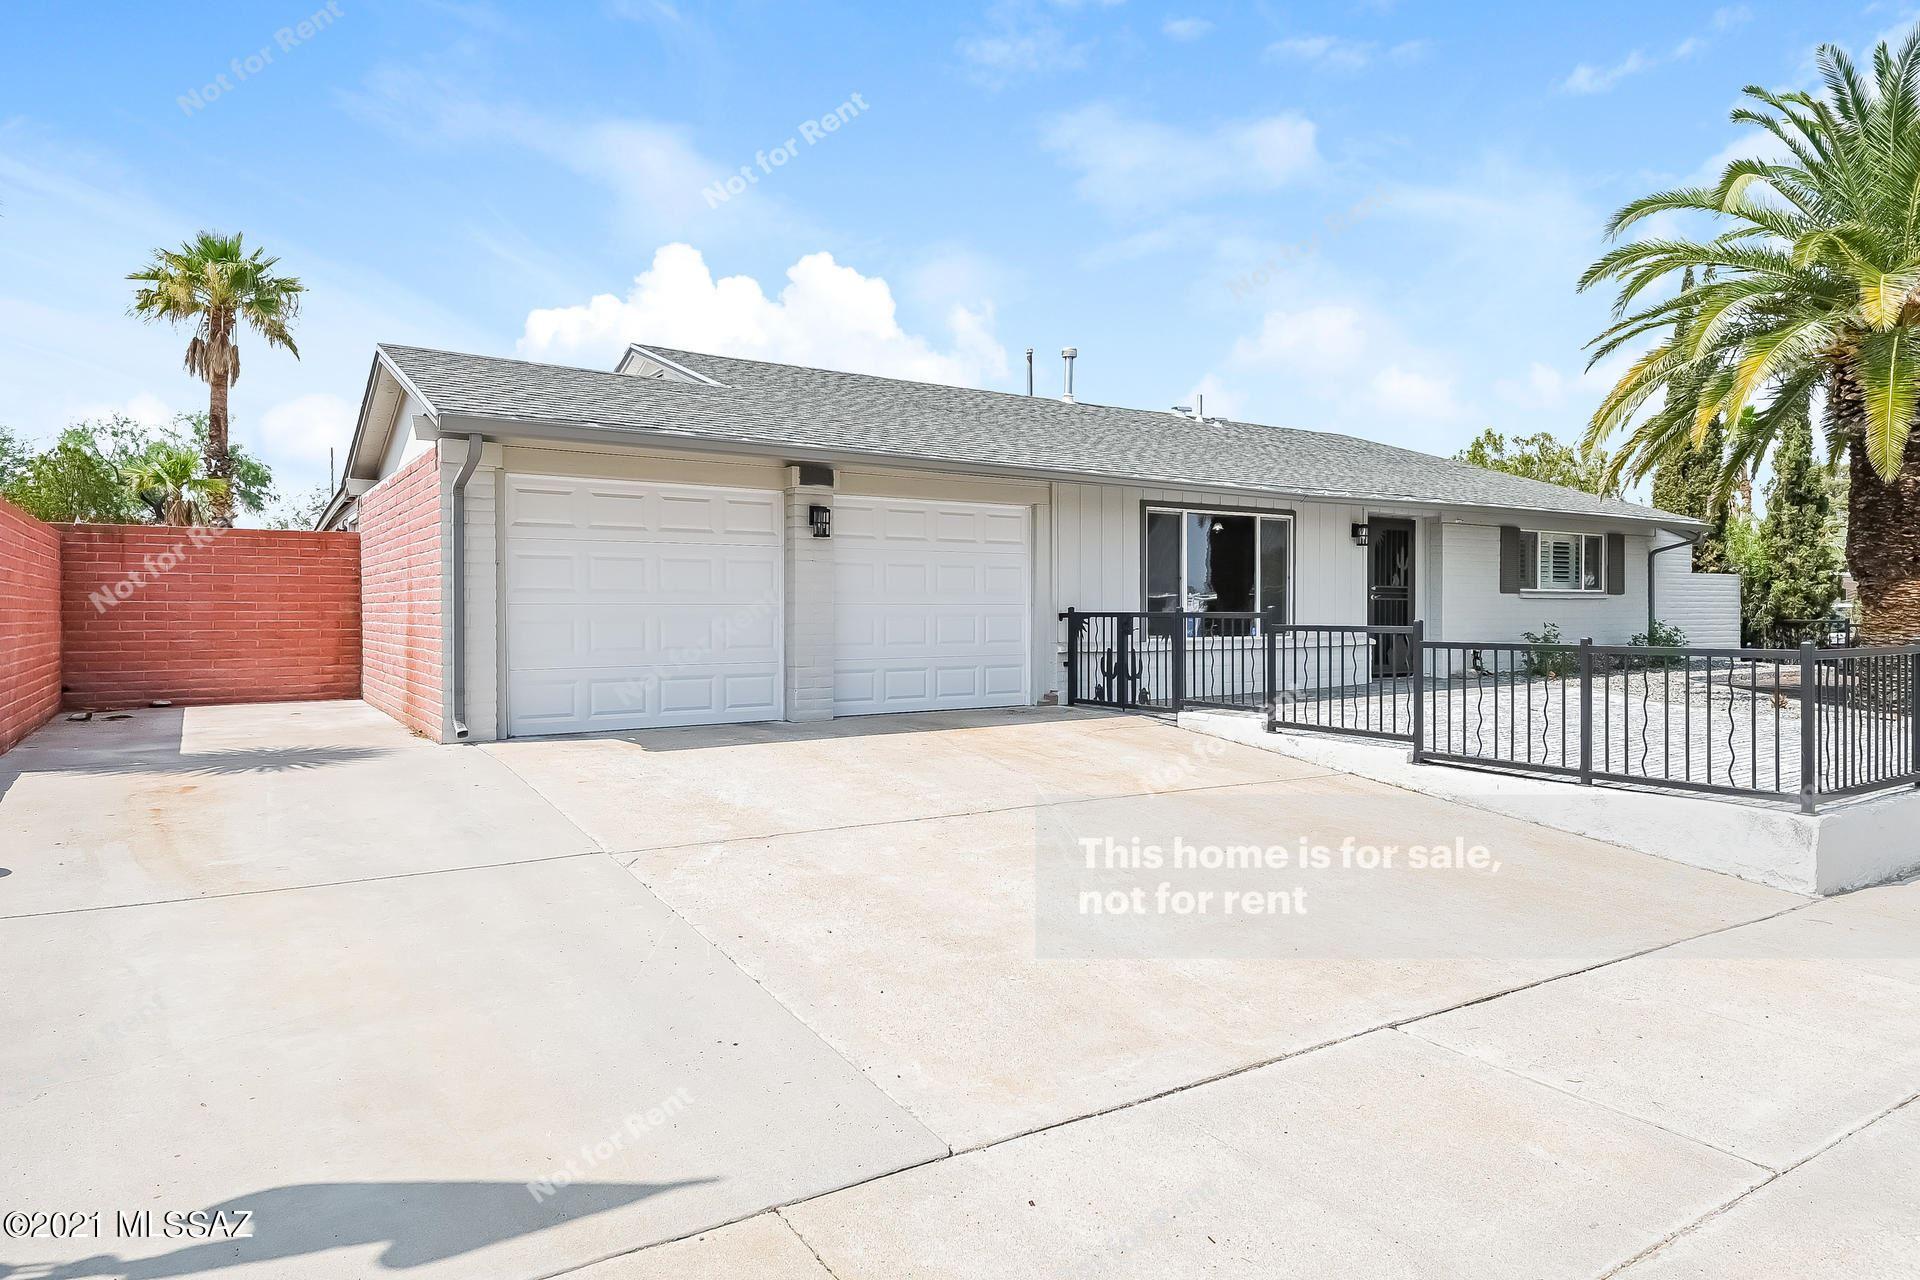 9148 E Bellevue Street, Tucson, AZ 85715 - MLS#: 22118057